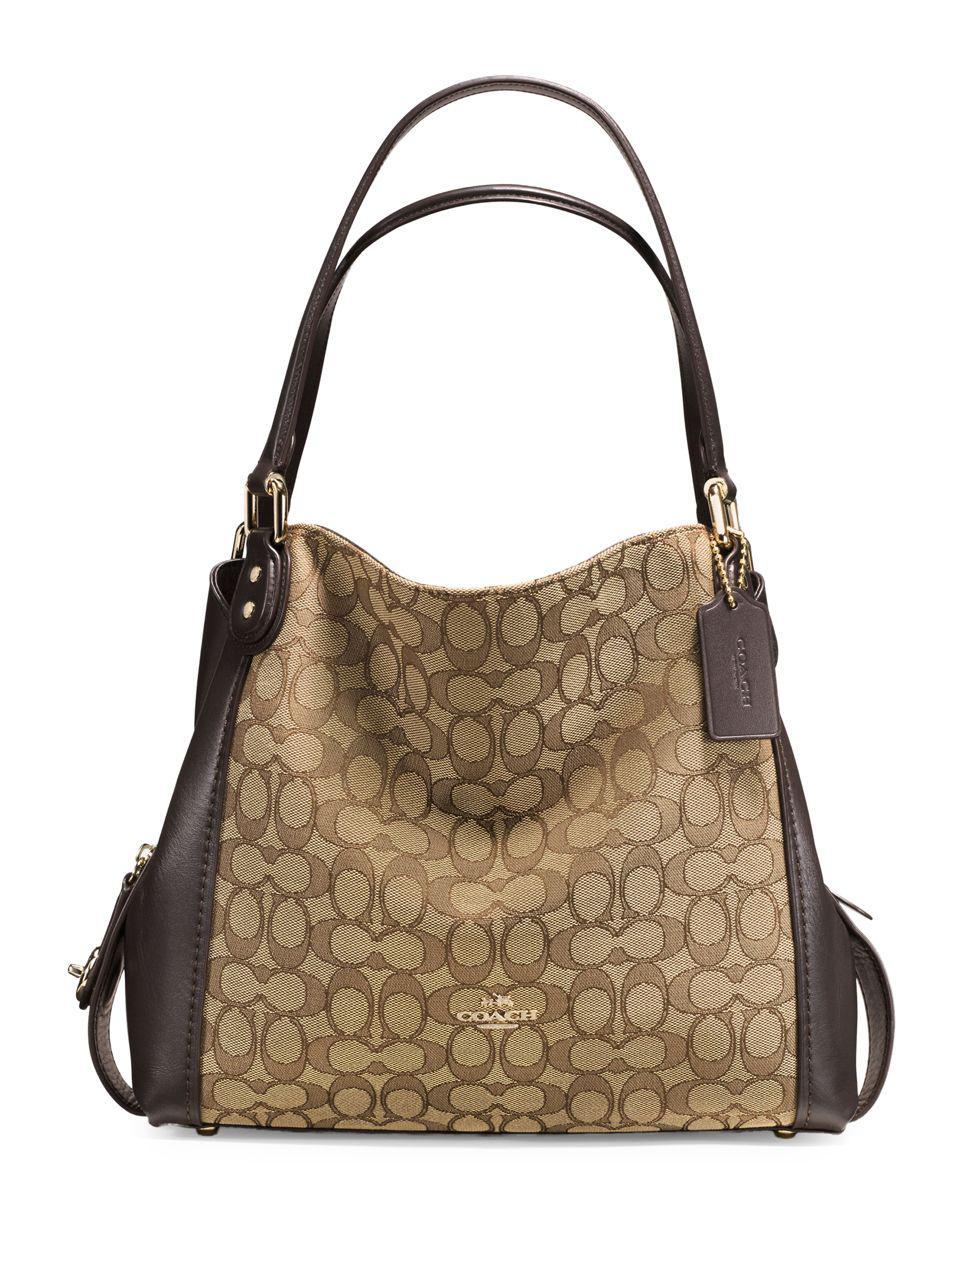 5856306fd6 Lyst - Coach Edie 31 Signature Jacquard Shoulder Bag in Brown